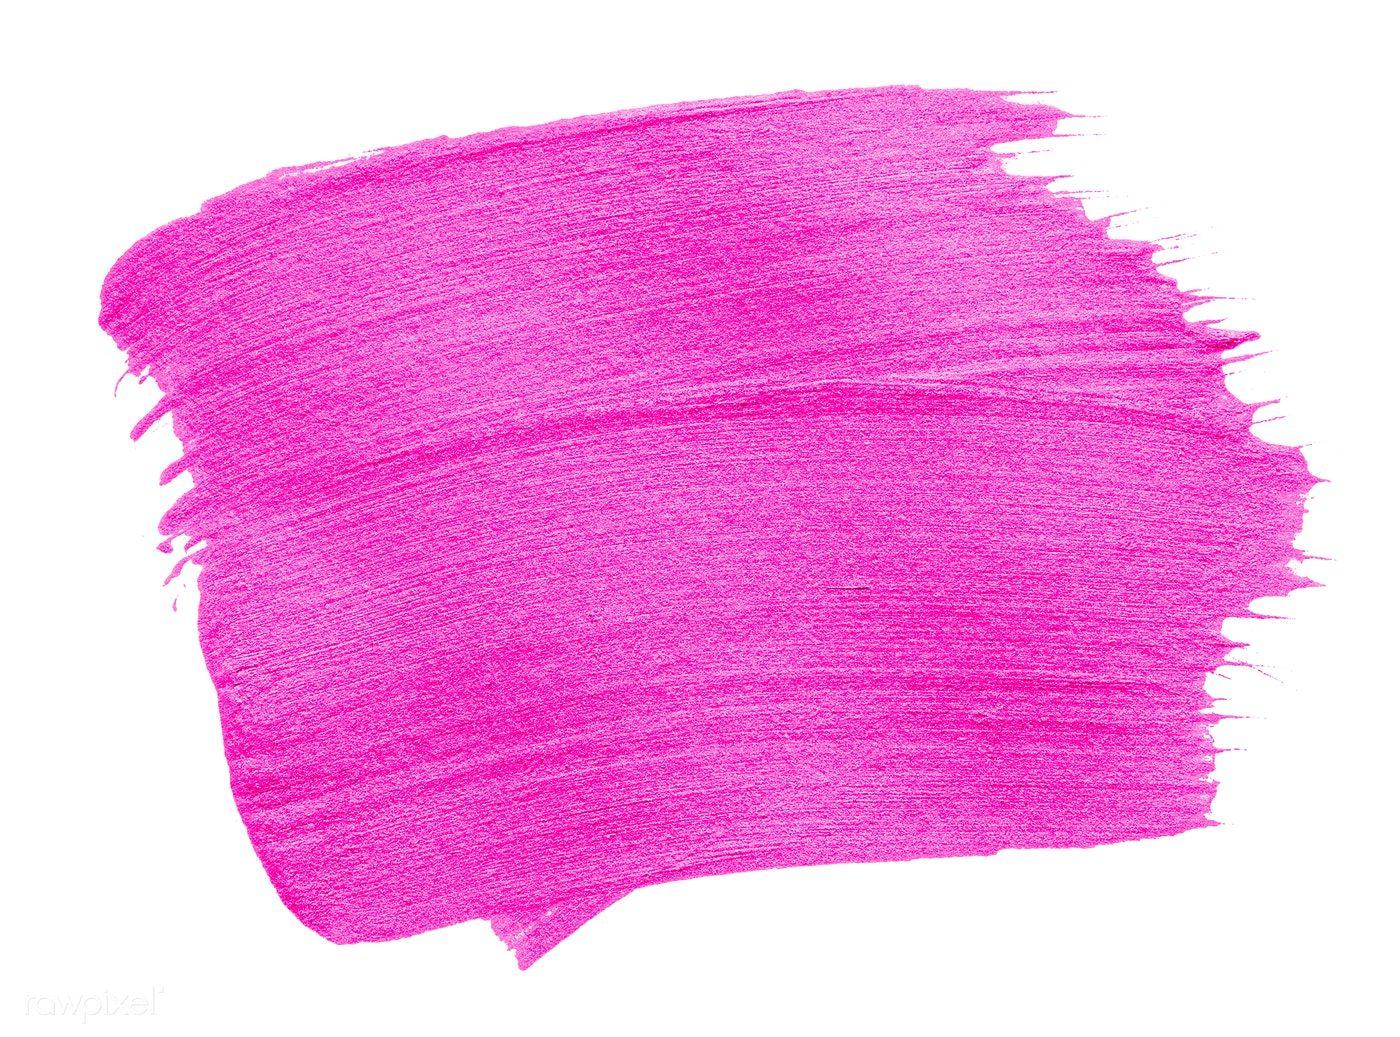 Neon Pink Brush Stroke Background Free Image By Rawpixel Com Pink Brushes Brush Strokes Neon Pink